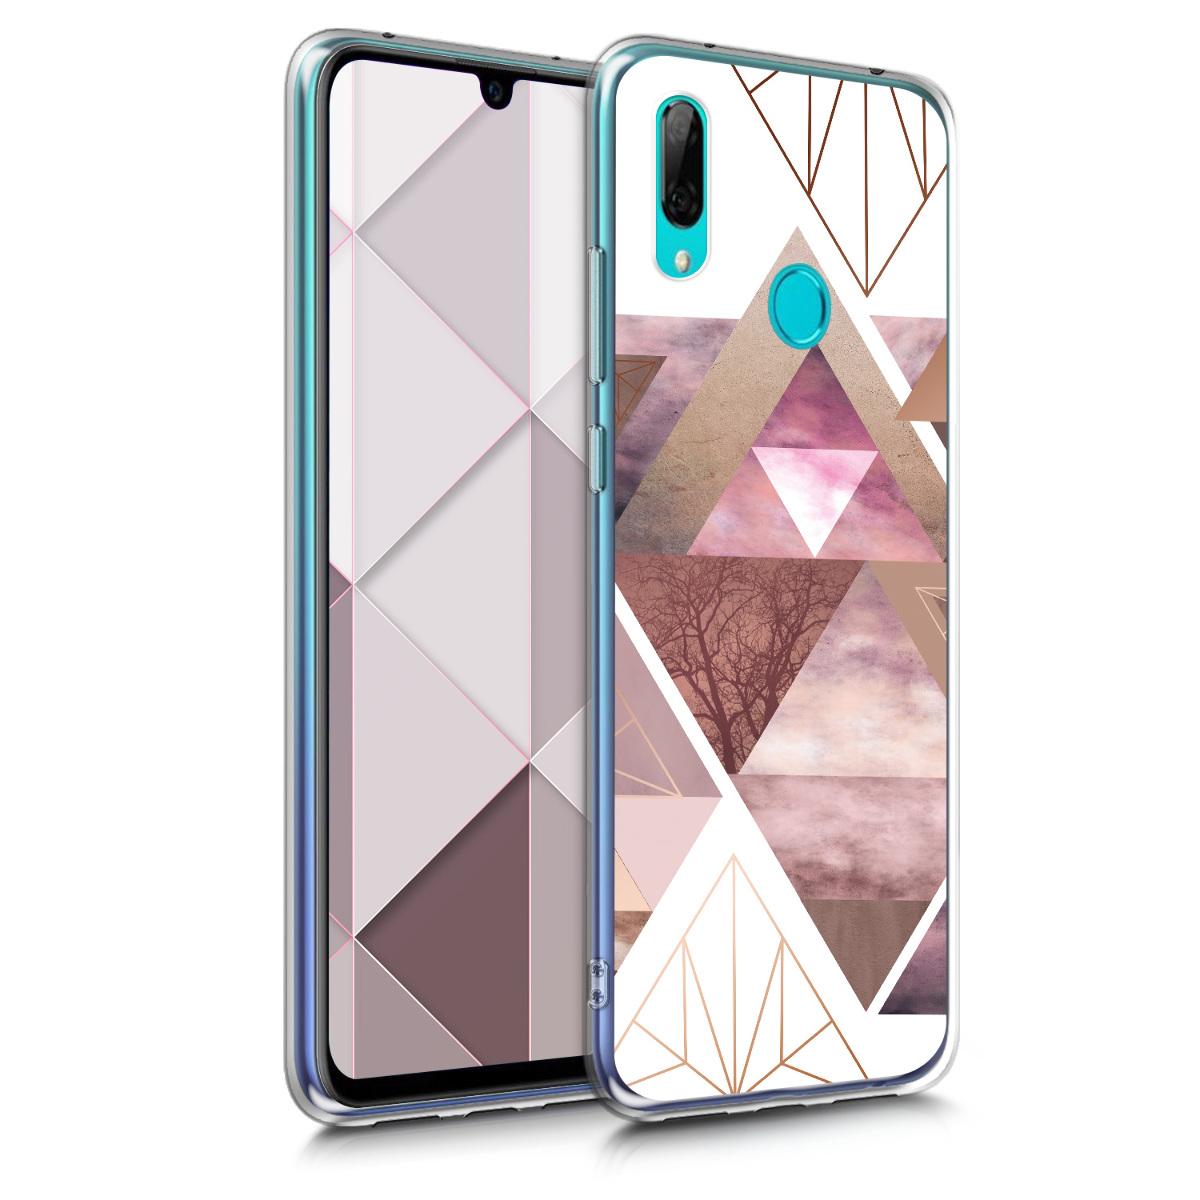 KW Θήκη Σιλικόνης Huawei Y7 / Y7 Prime 2019 - Light Pink / Rose Gold / White (48936.01)